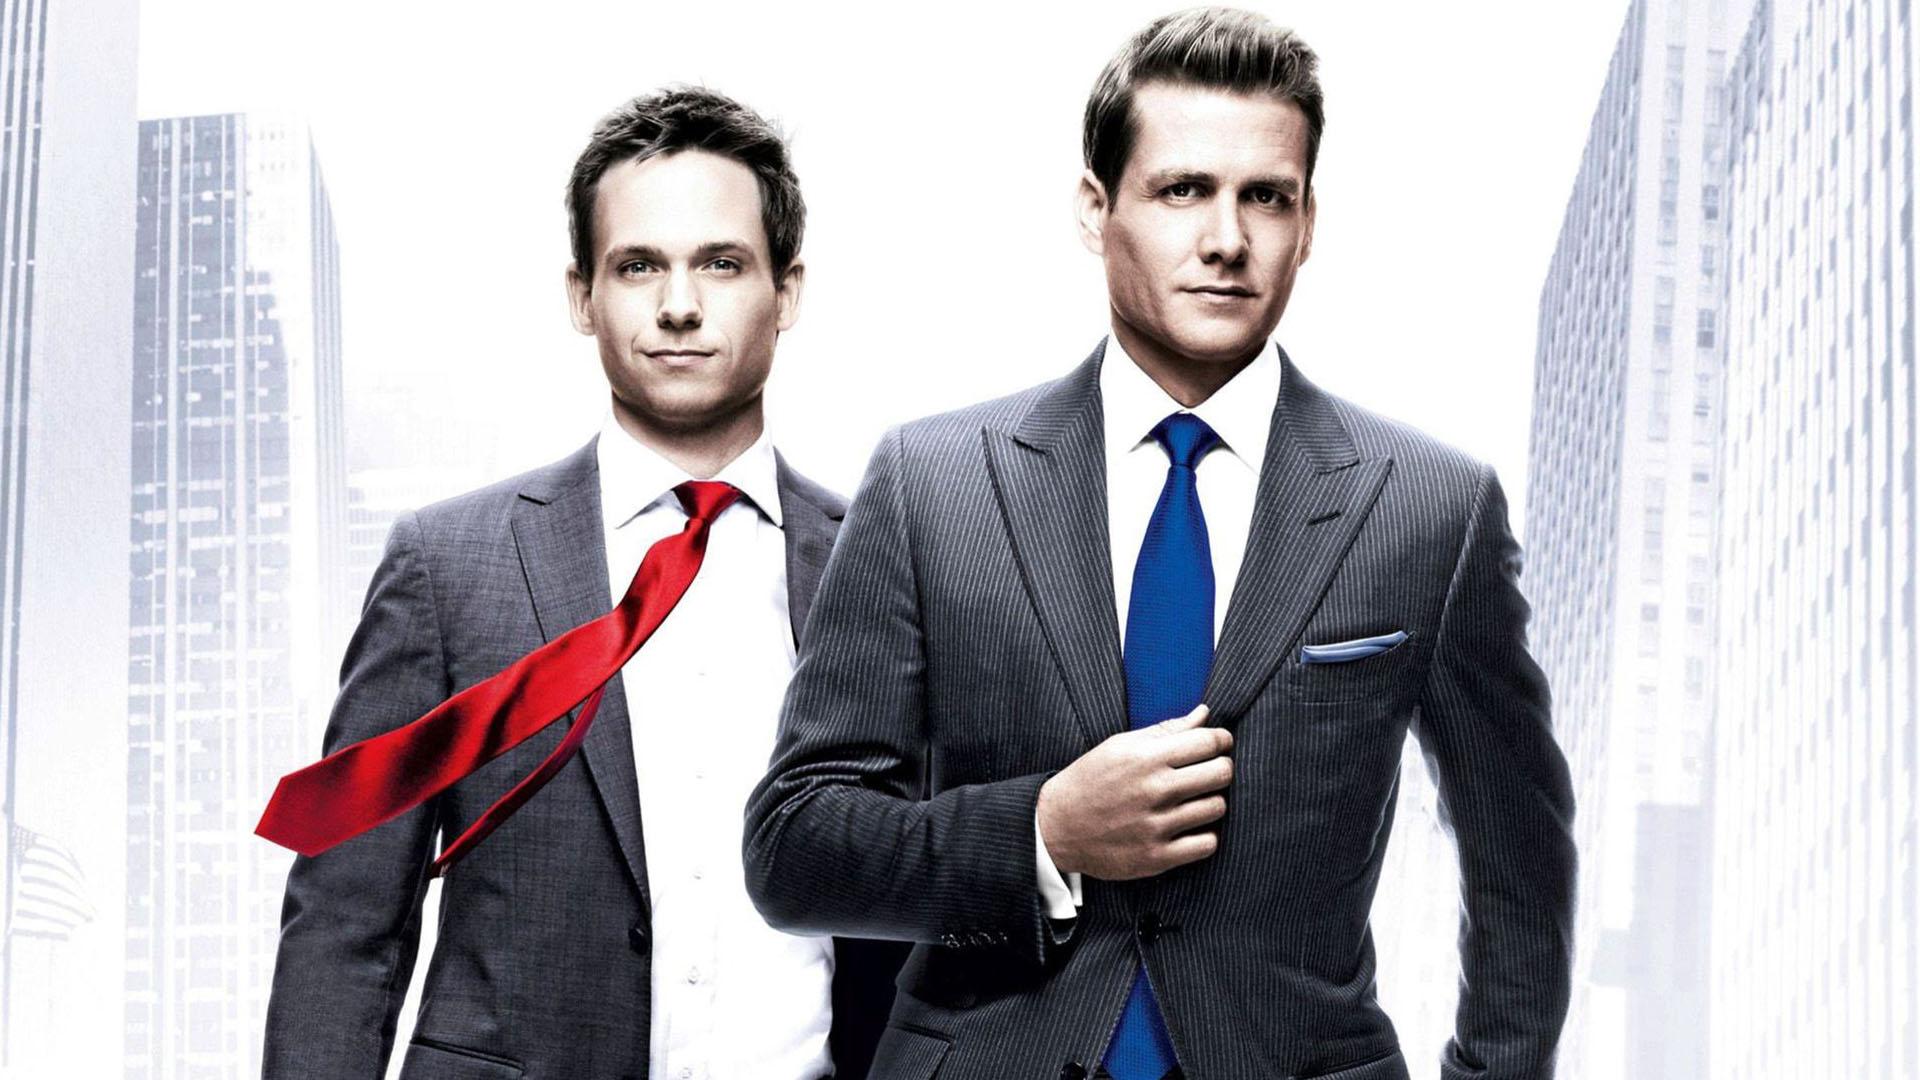 Suits Wallpaper - Suits Tv Show , HD Wallpaper & Backgrounds